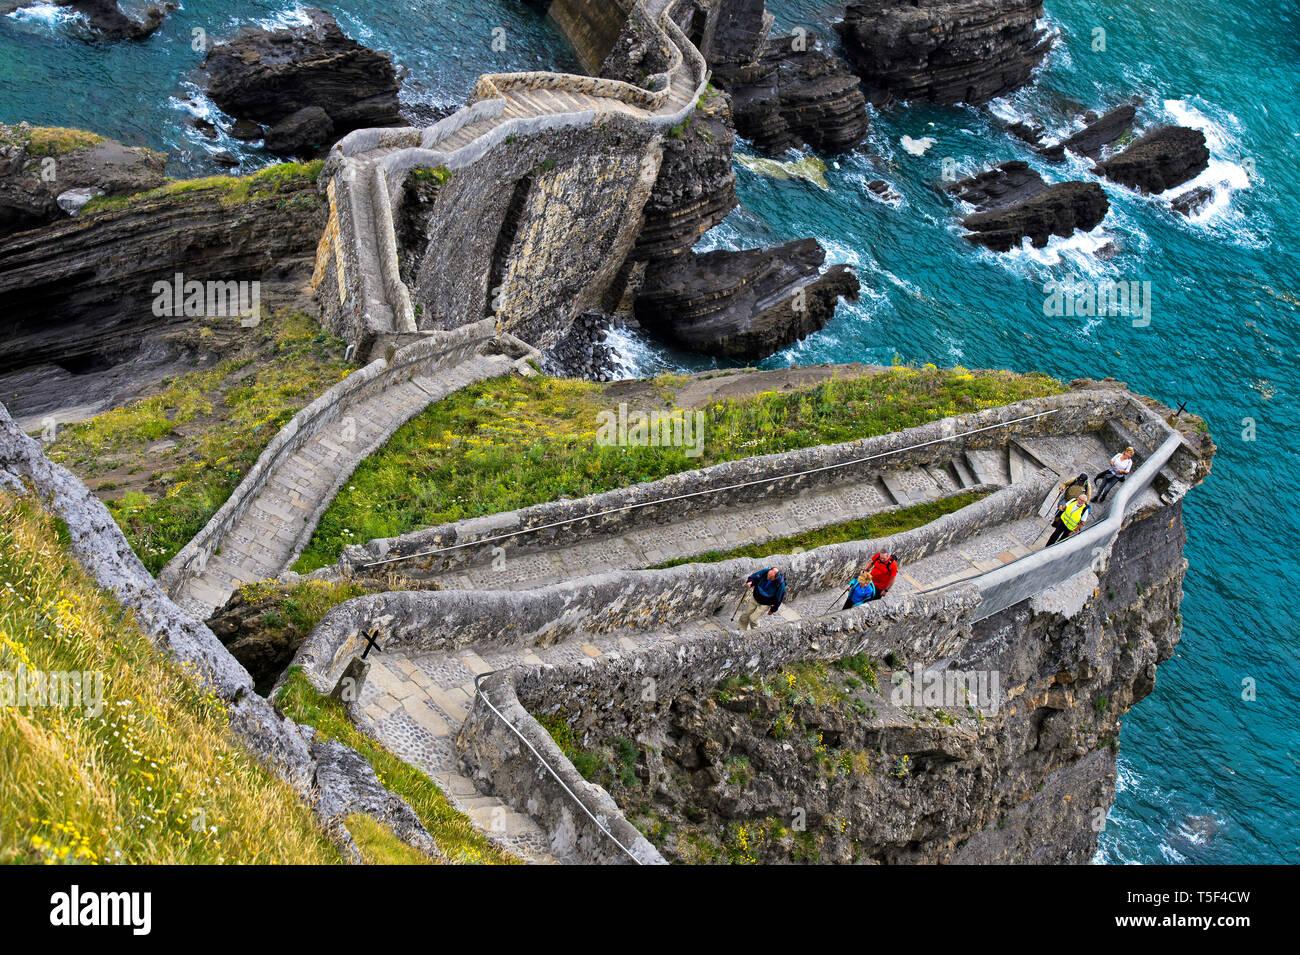 Zigzag path to the islet Gaztelugatxe near Bakio, Costa Vasca, Bay of Biscay, Basque Country, Spanien - Stock Image